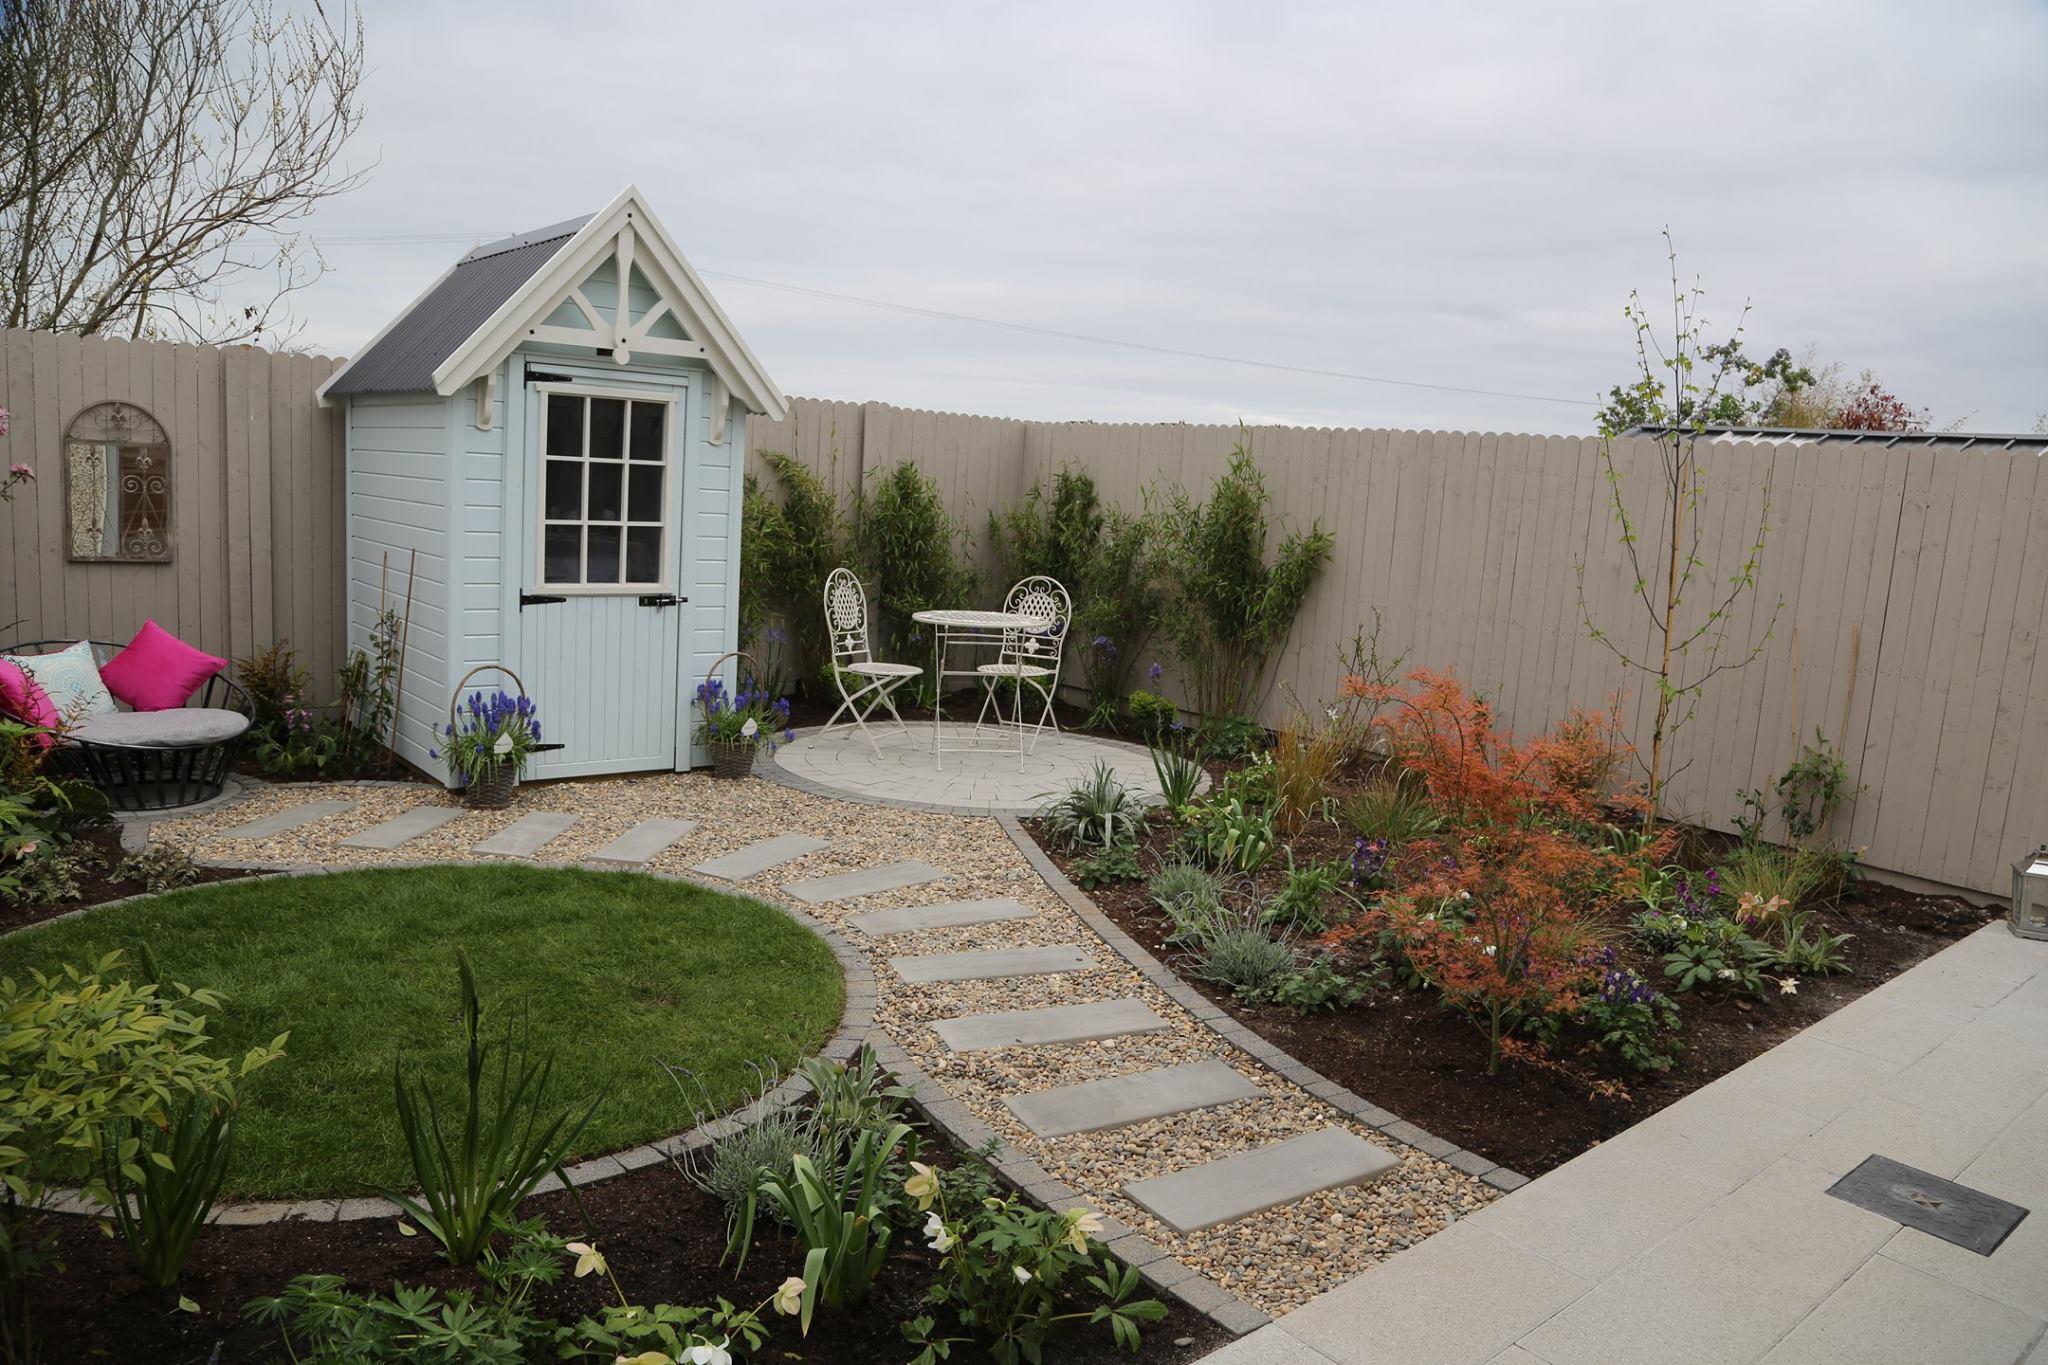 Garden Sheds Ireland Presented By Boyne Garden Sheds